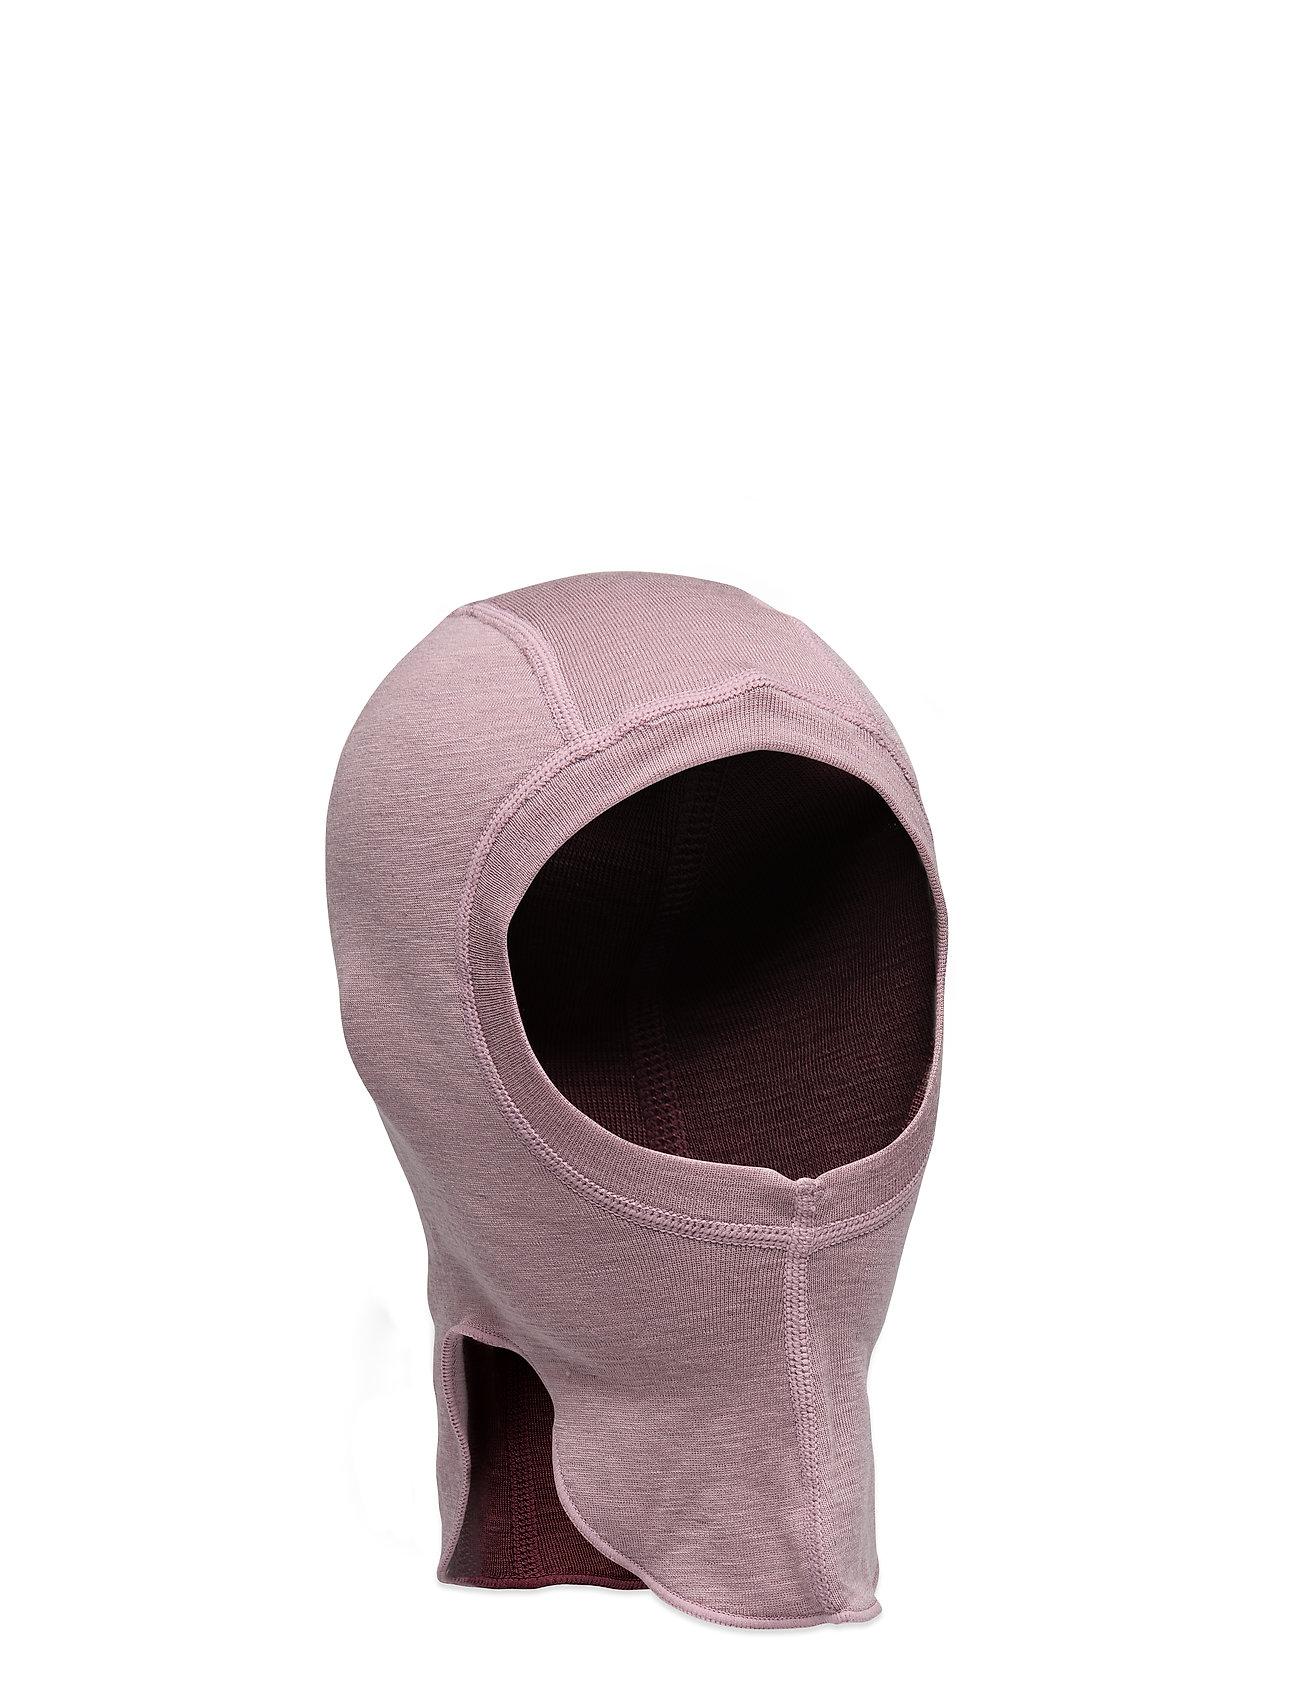 Image of Balaclava, Double Layer Accessories Headwear Balaclava Lilla CeLaVi (3445586555)